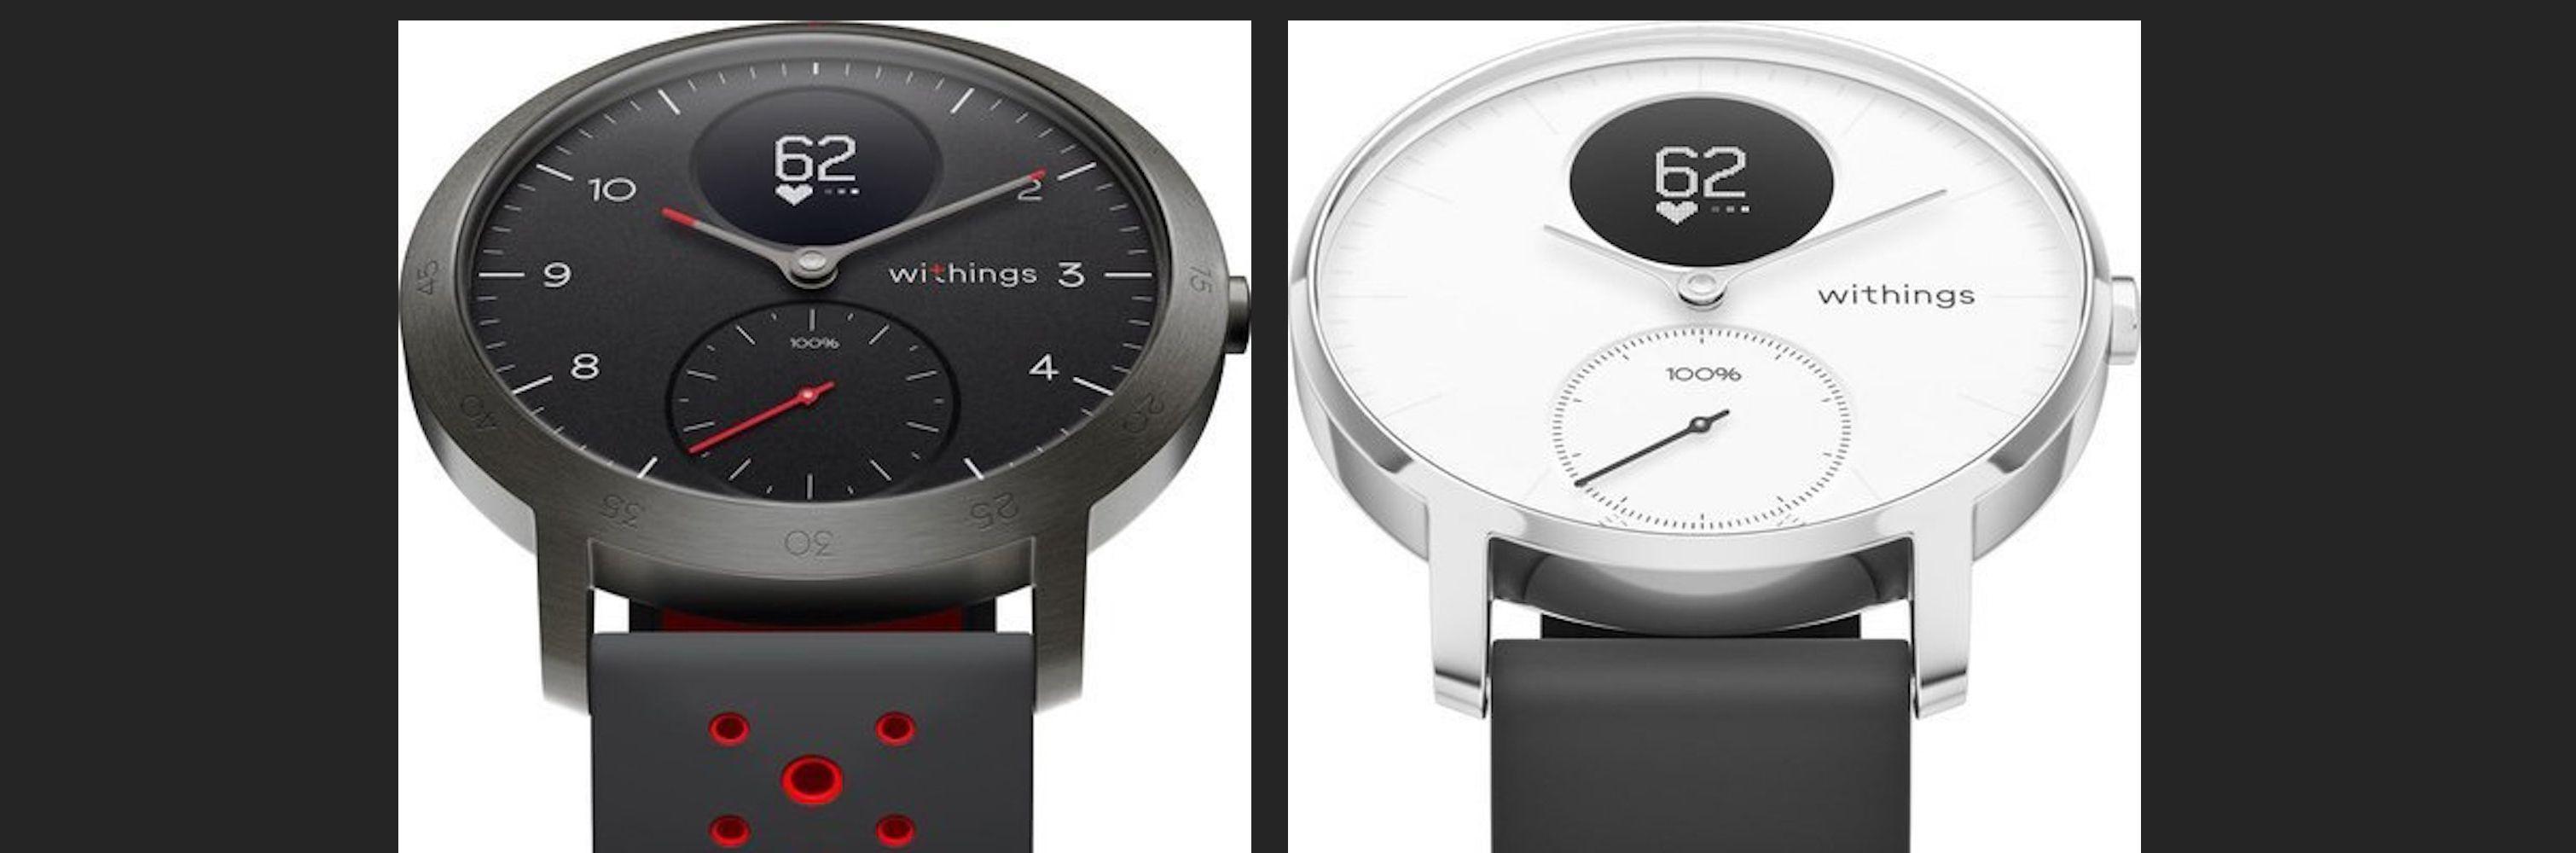 Withings hybrid smartwatch Apple Watch alternative